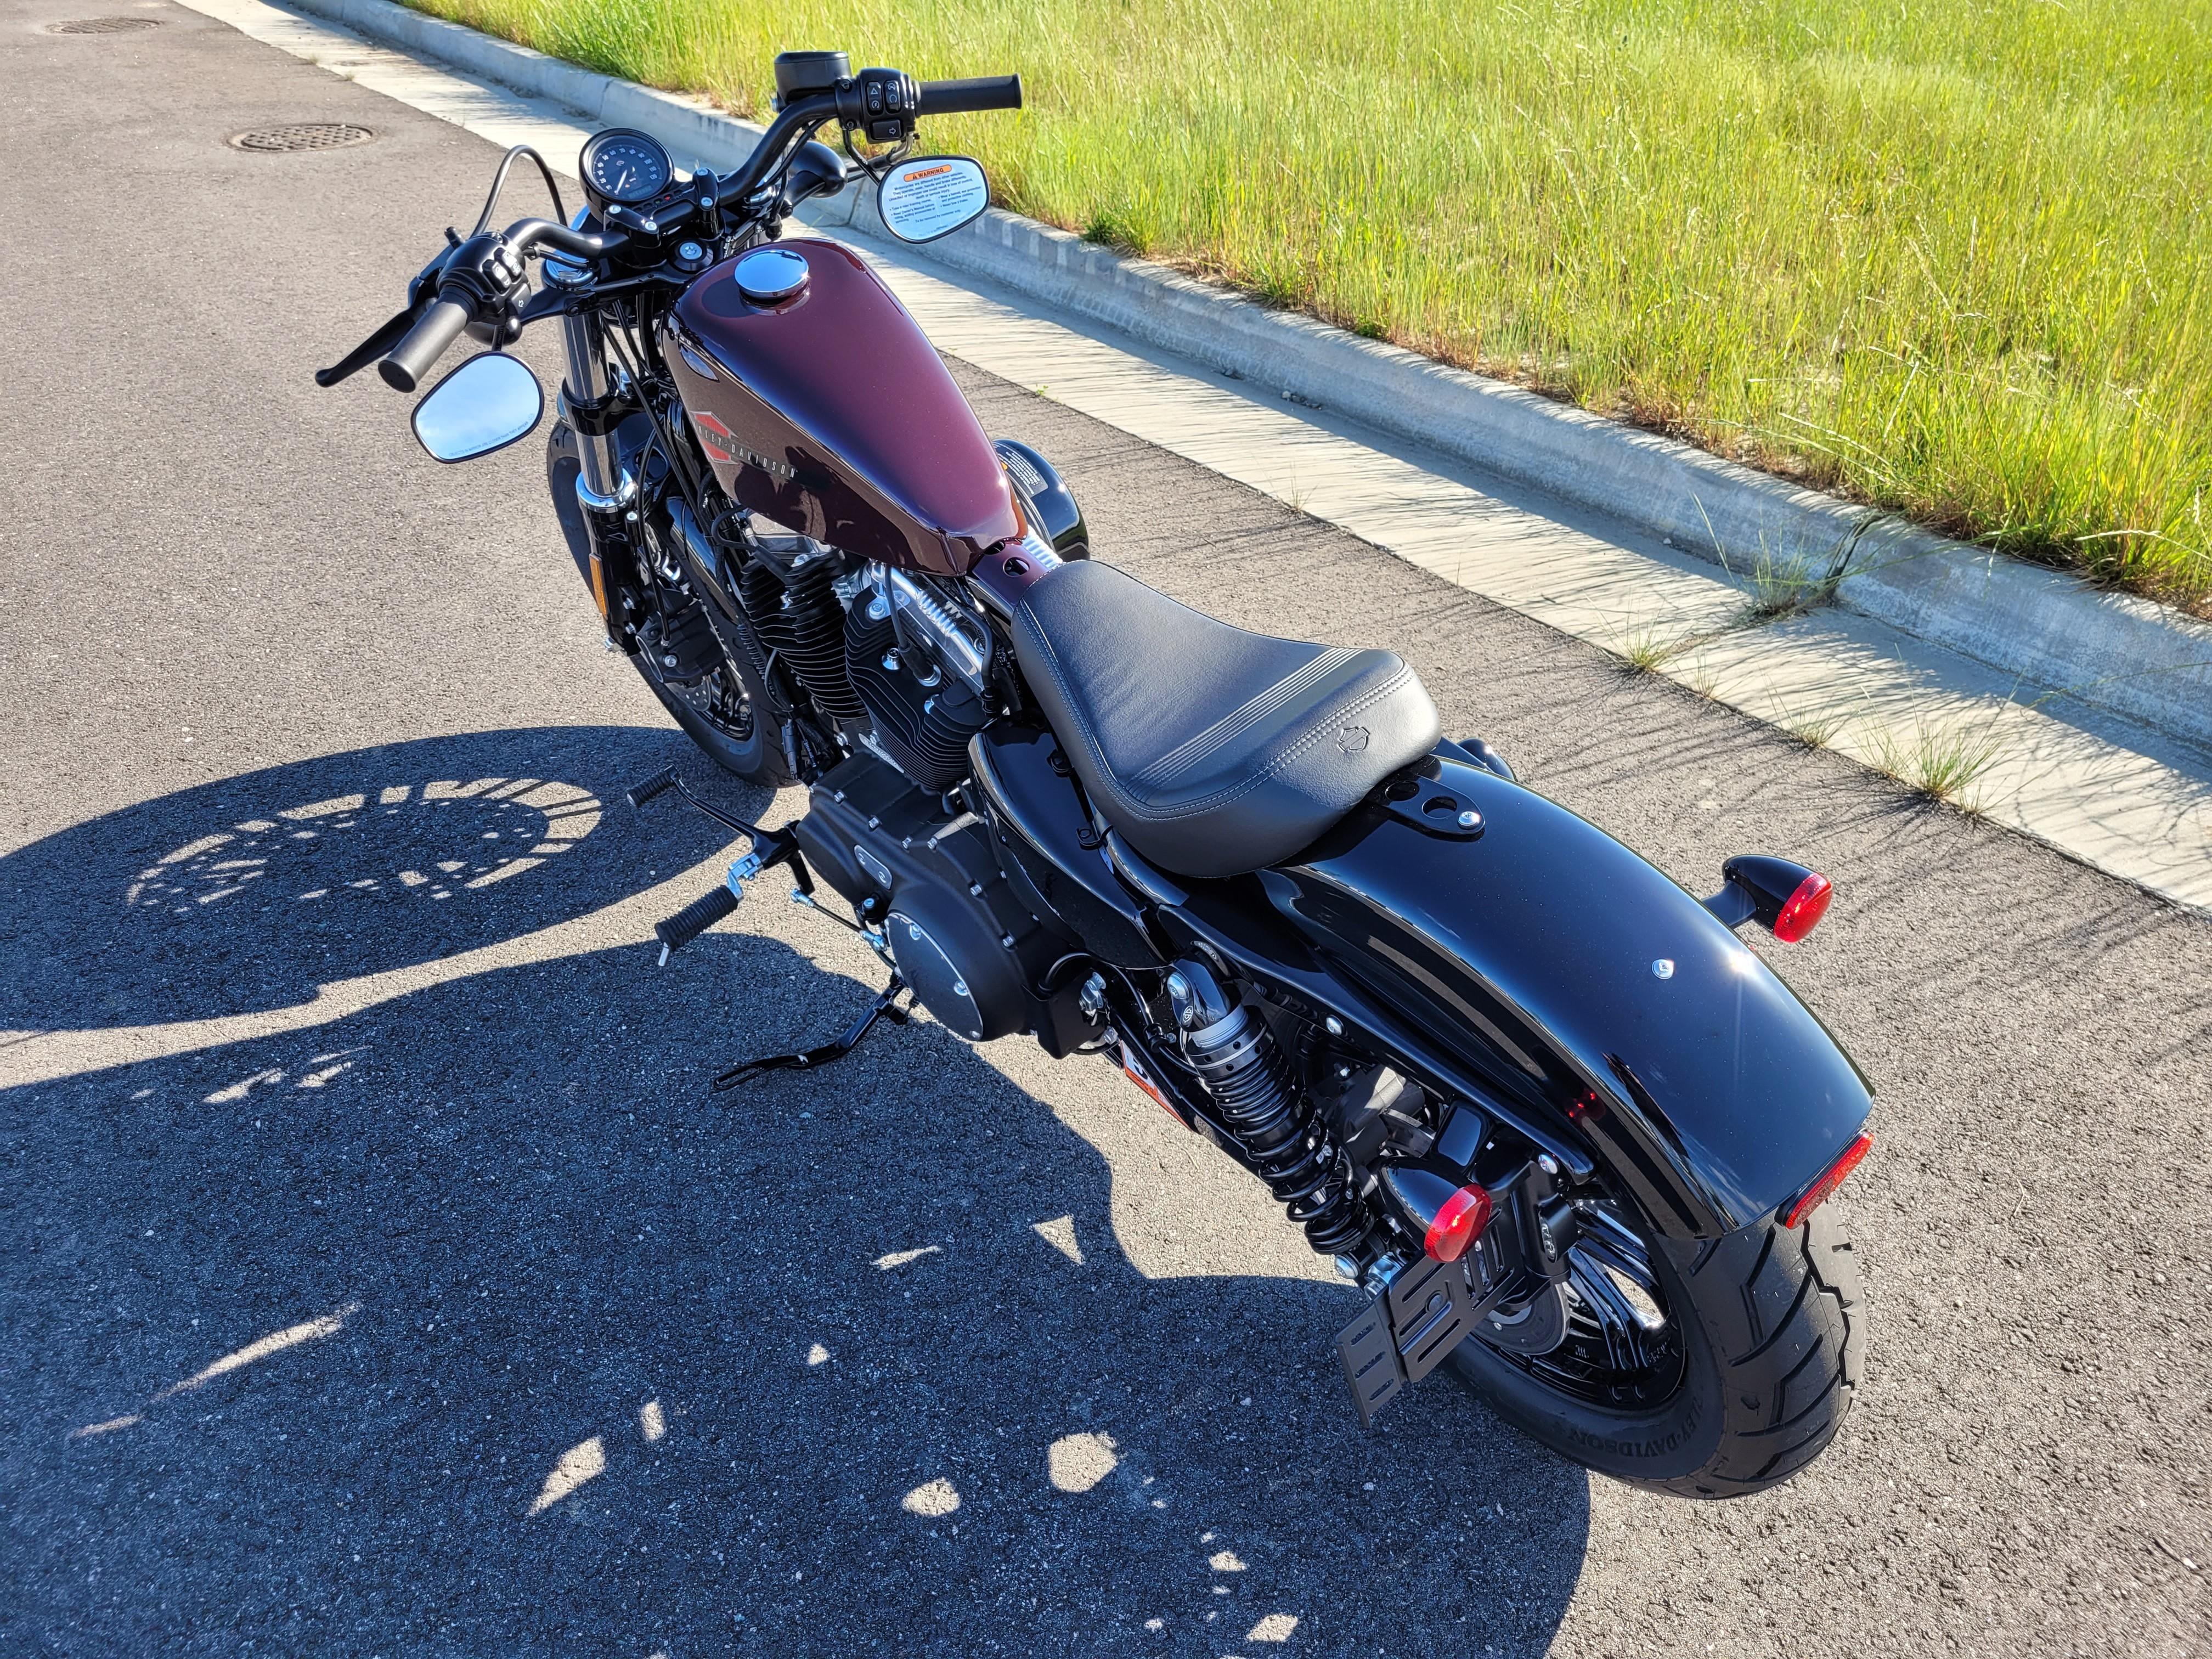 2021 Harley-Davidson Cruiser XL 1200X Forty-Eight at Richmond Harley-Davidson